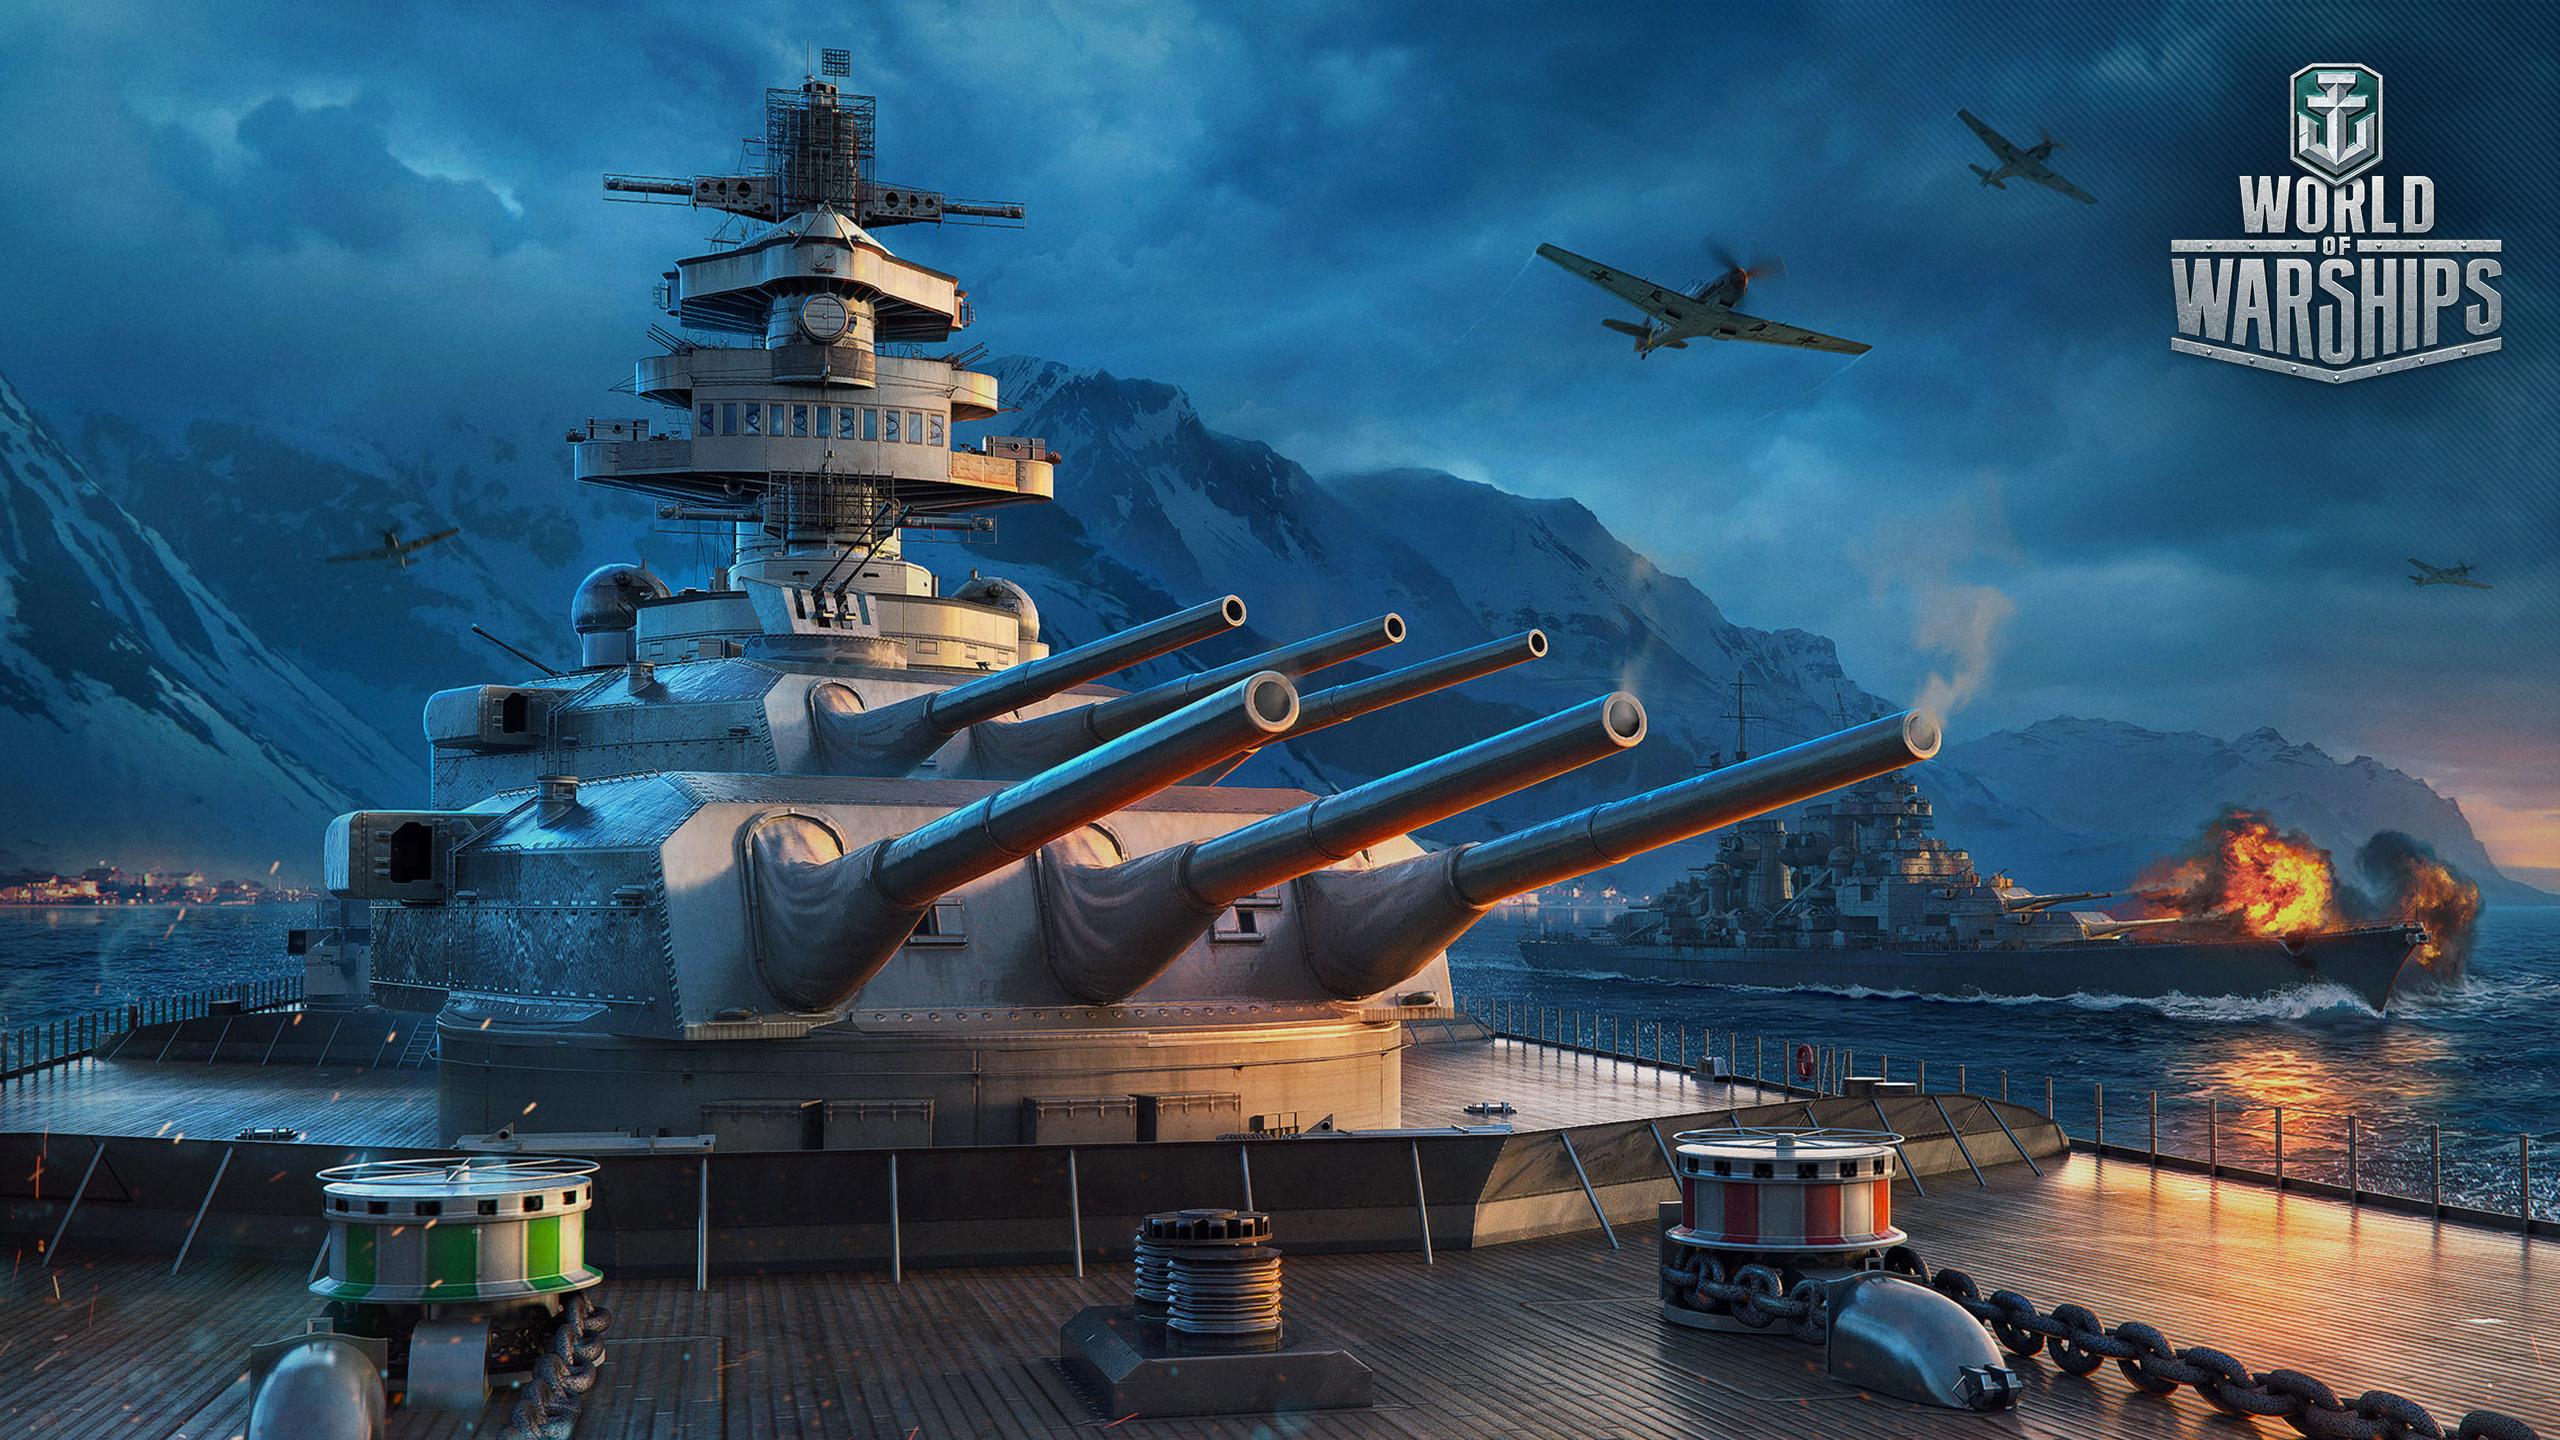 Desktop Wallpapers World Of Warship German Ships vdeo game 2560x1440